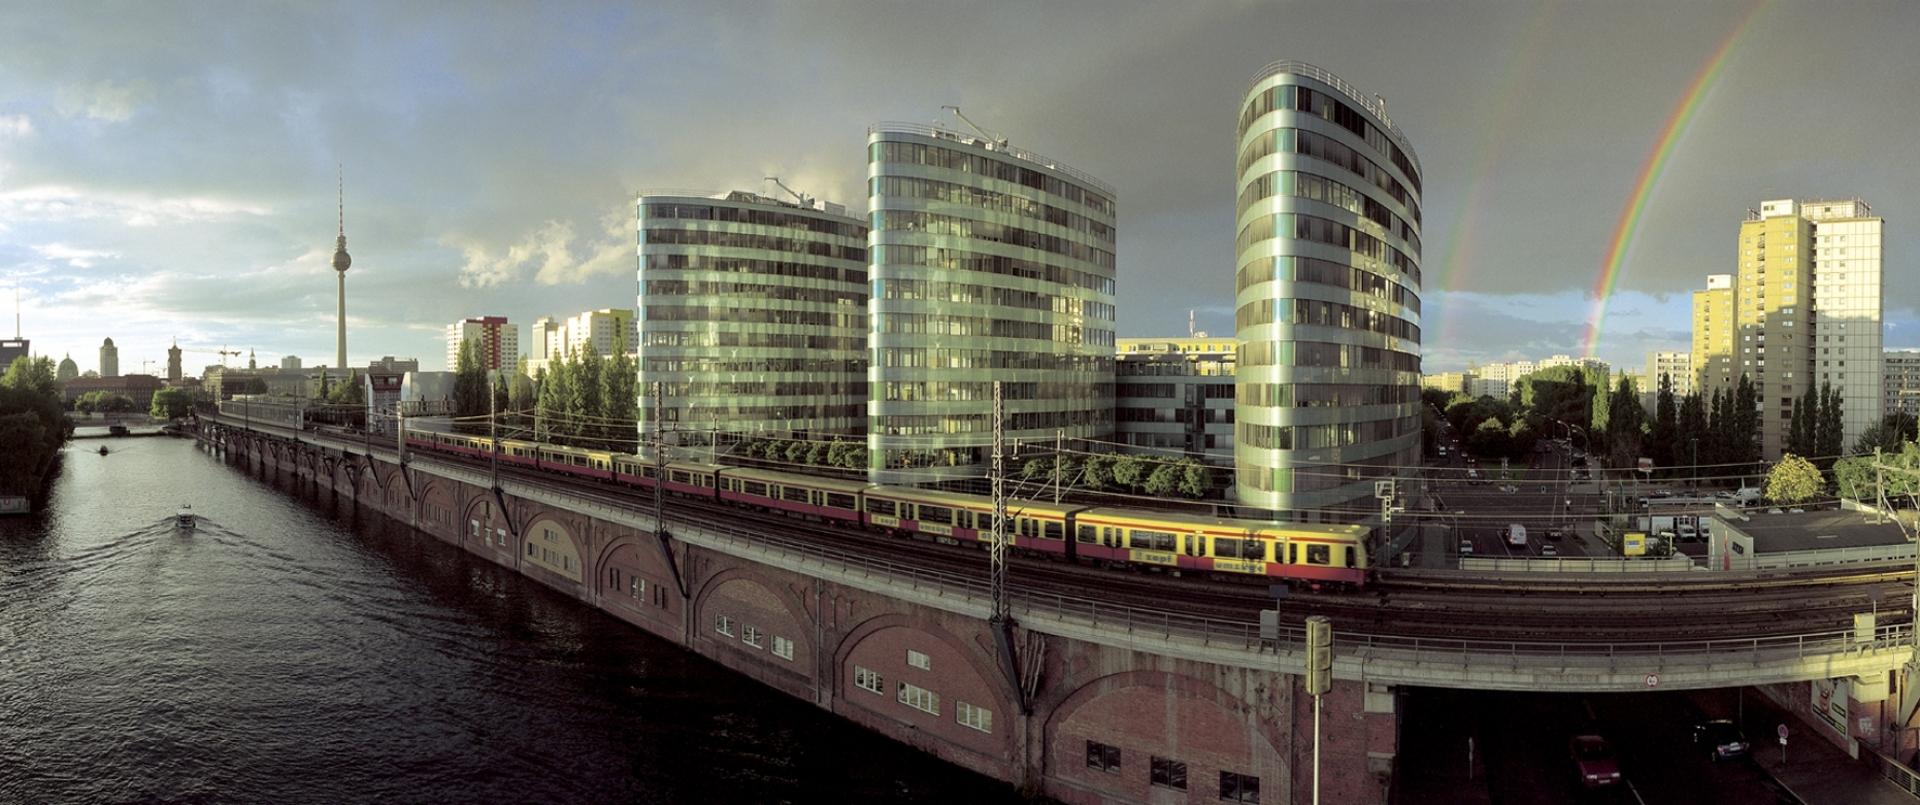 Street Photography – Tour Berlin Kreuzberg - Canon Academy Spezialthemen